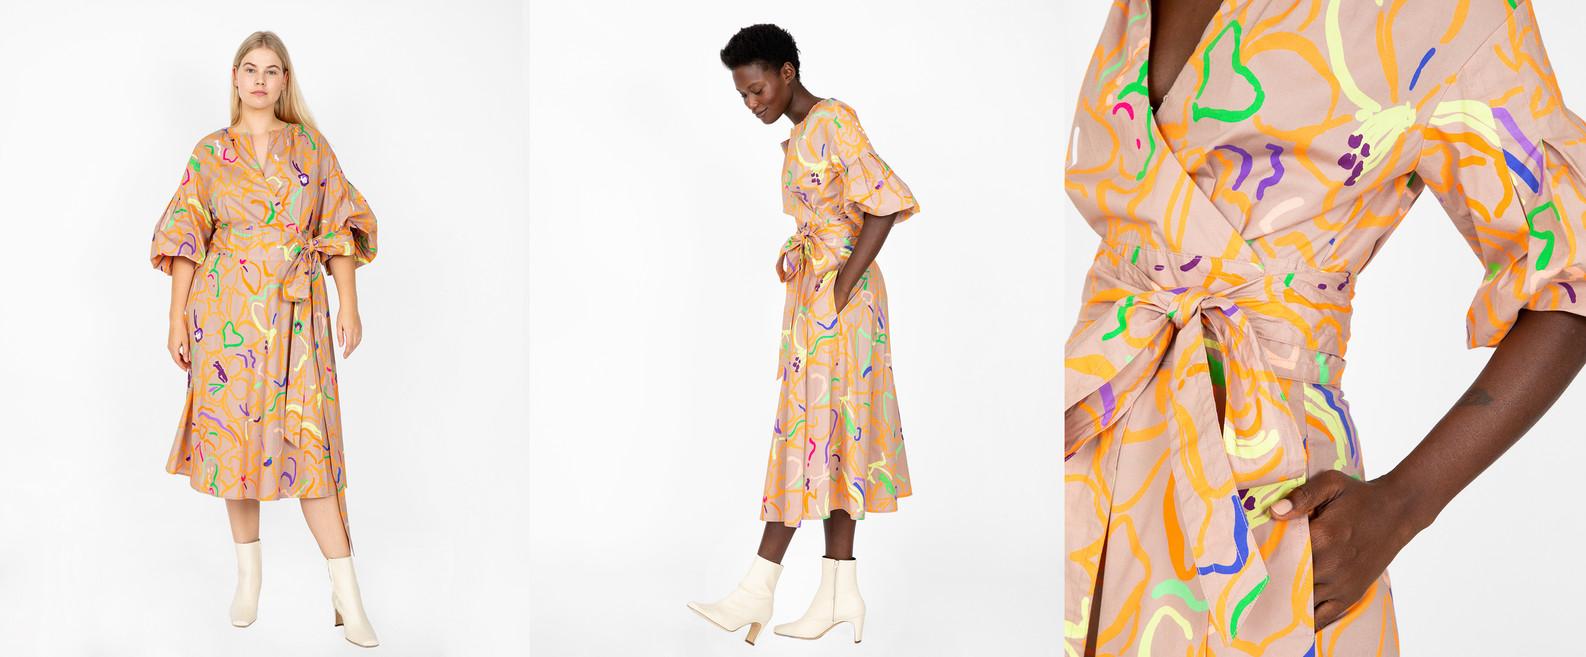 Tanya Taylor Ecom - Frida Dress 5.jpg